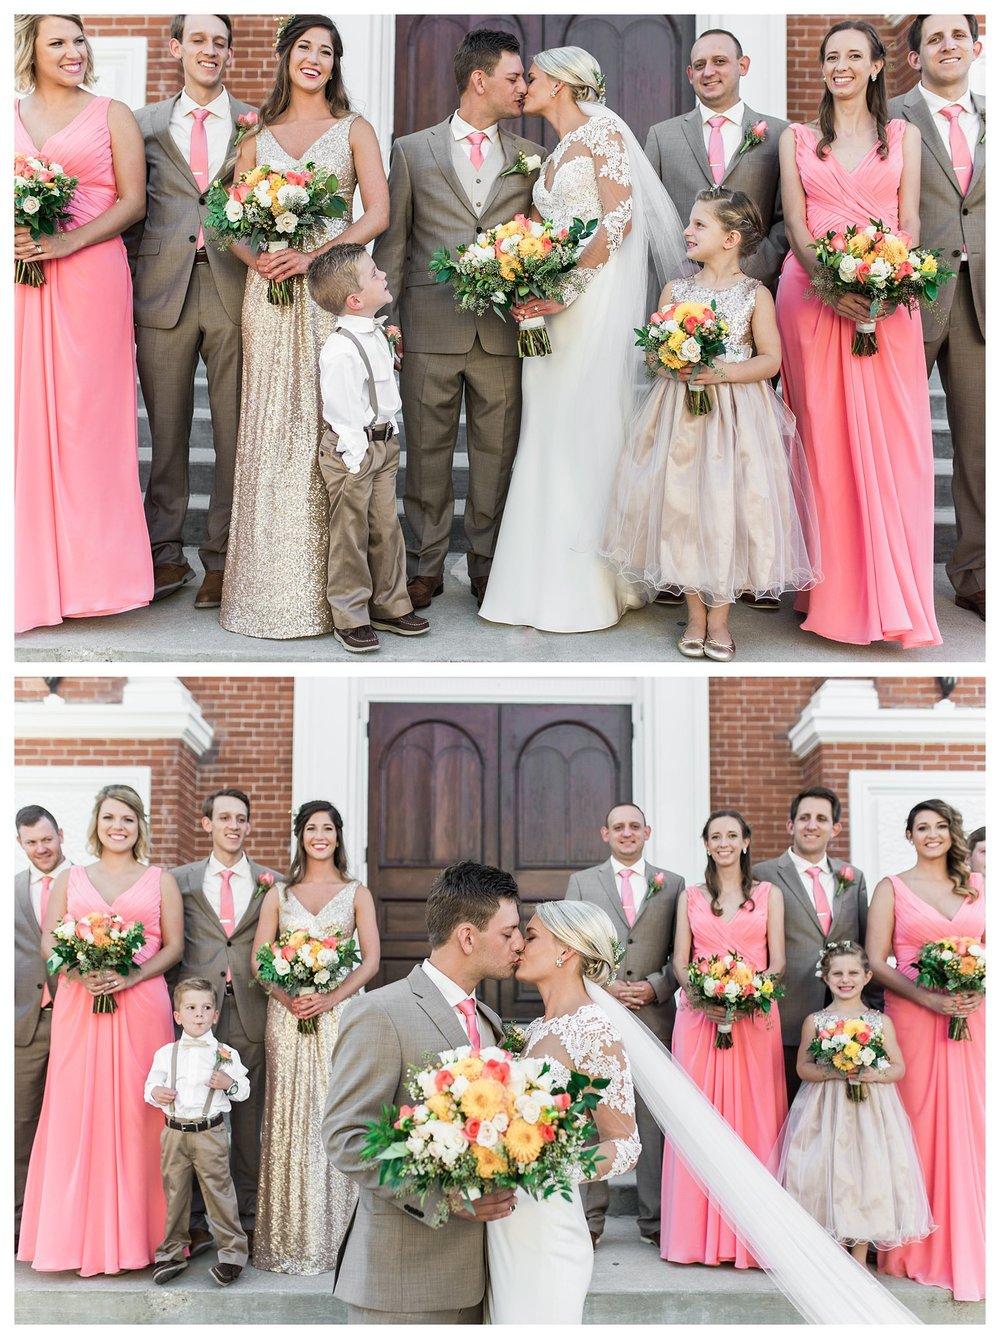 everleigh-photography-monastery-event-center-cincinnati-wedding-photographer-tara-and-elliot-heil-wedding-34